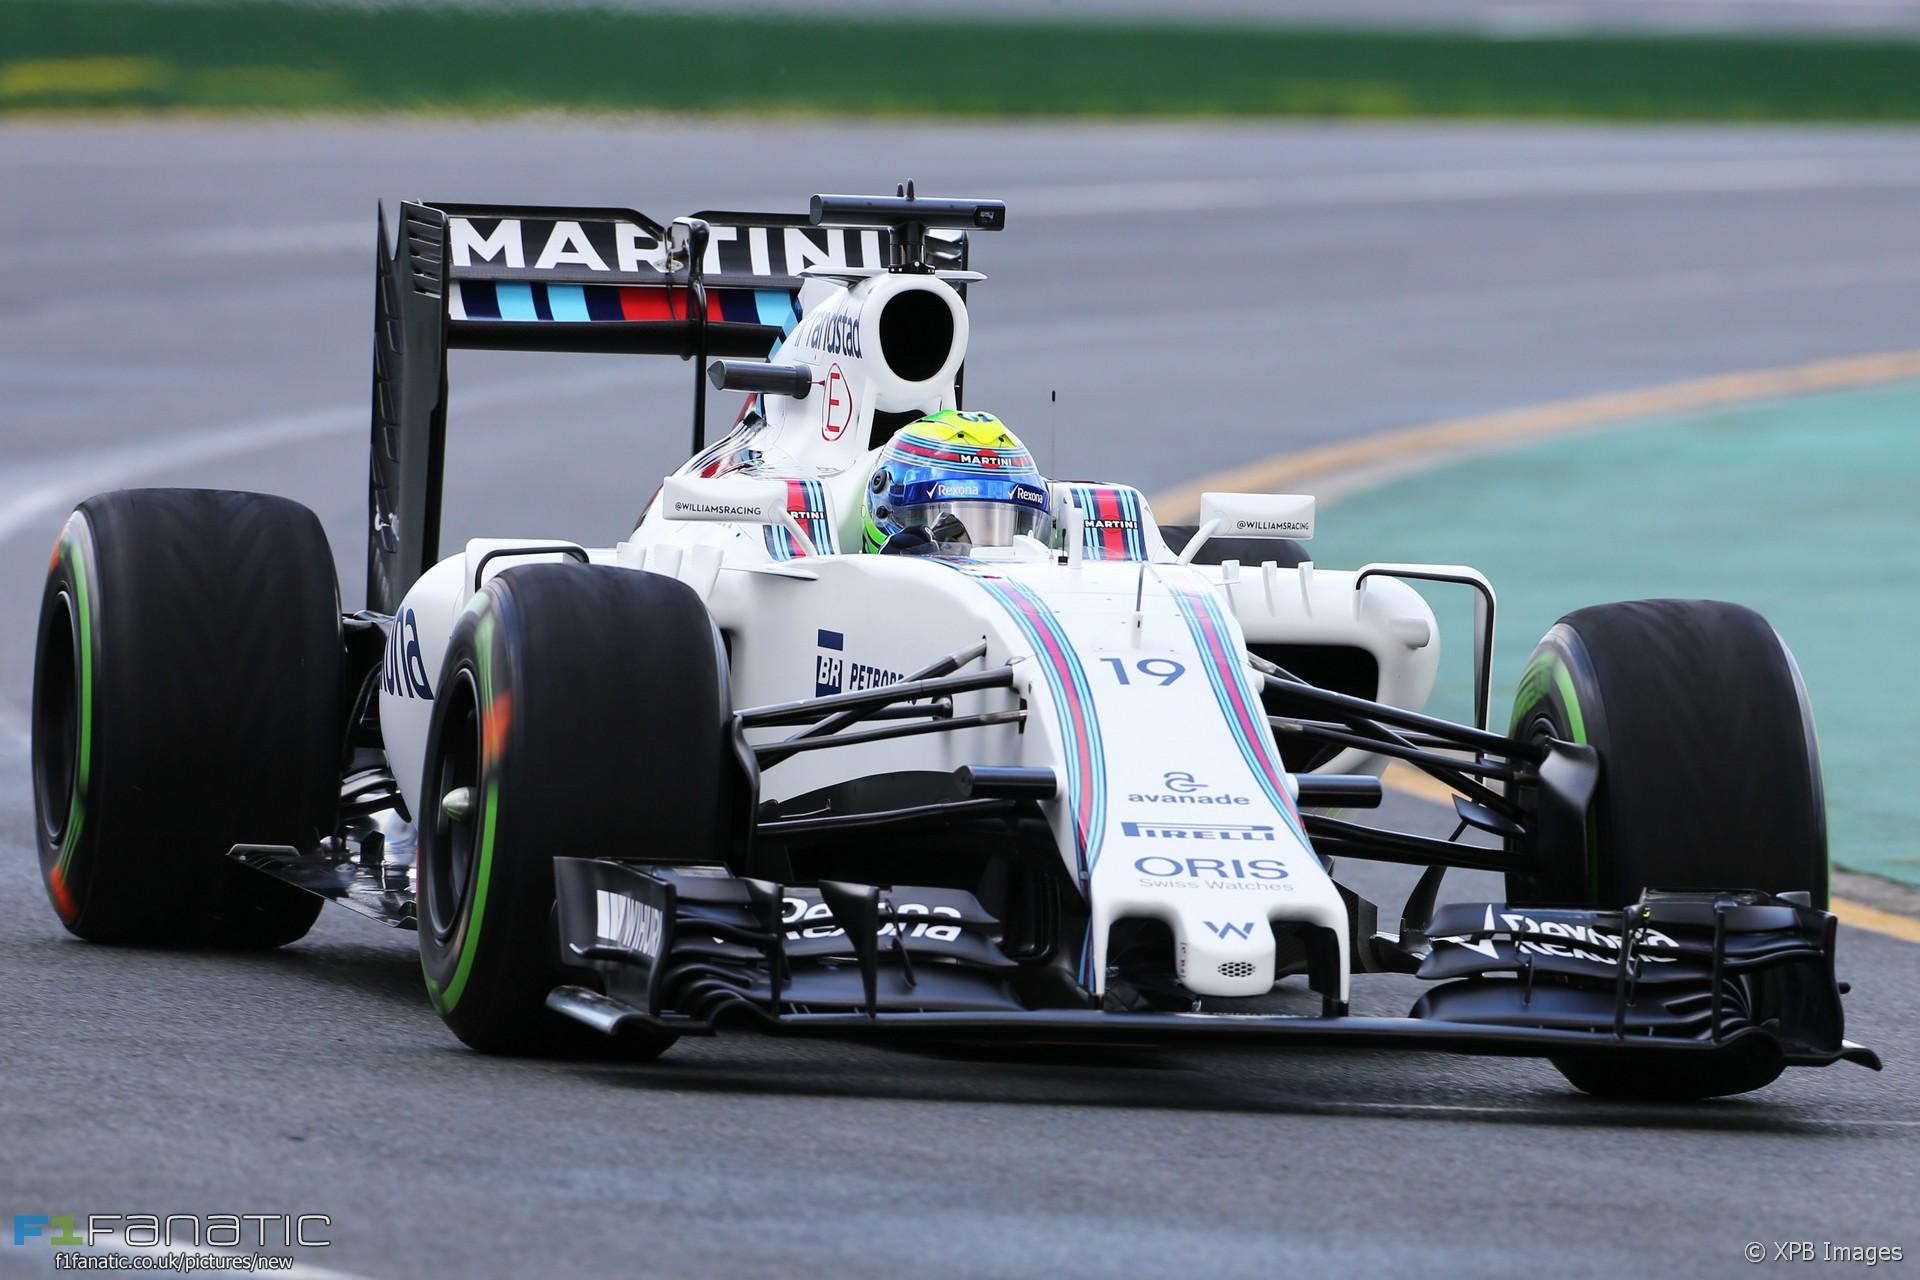 Equipe Williams de Formula 1 de 2016 by F1 Fanatic